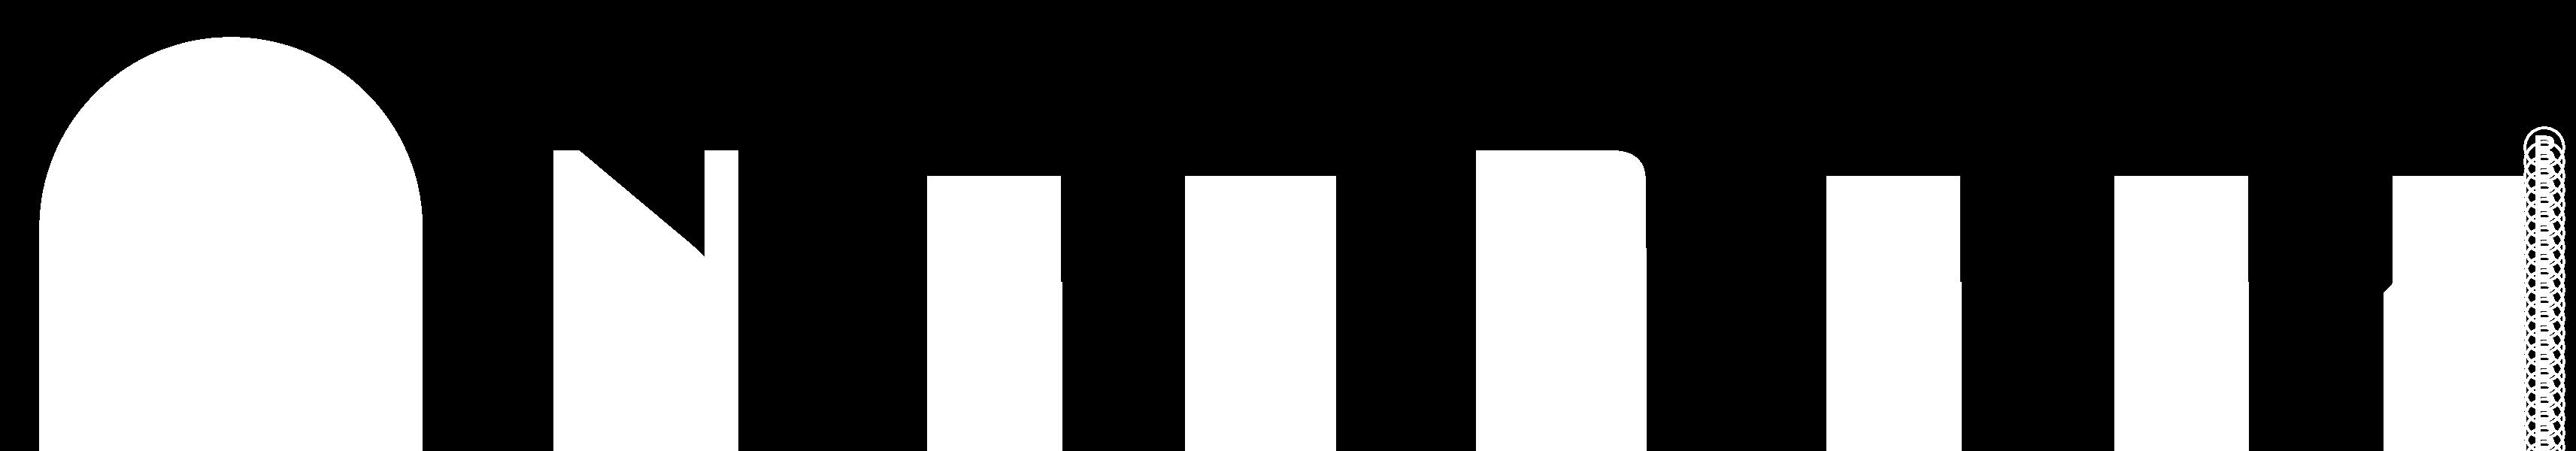 NB_logo_wordmark_final_white_reg_trademark-01-1